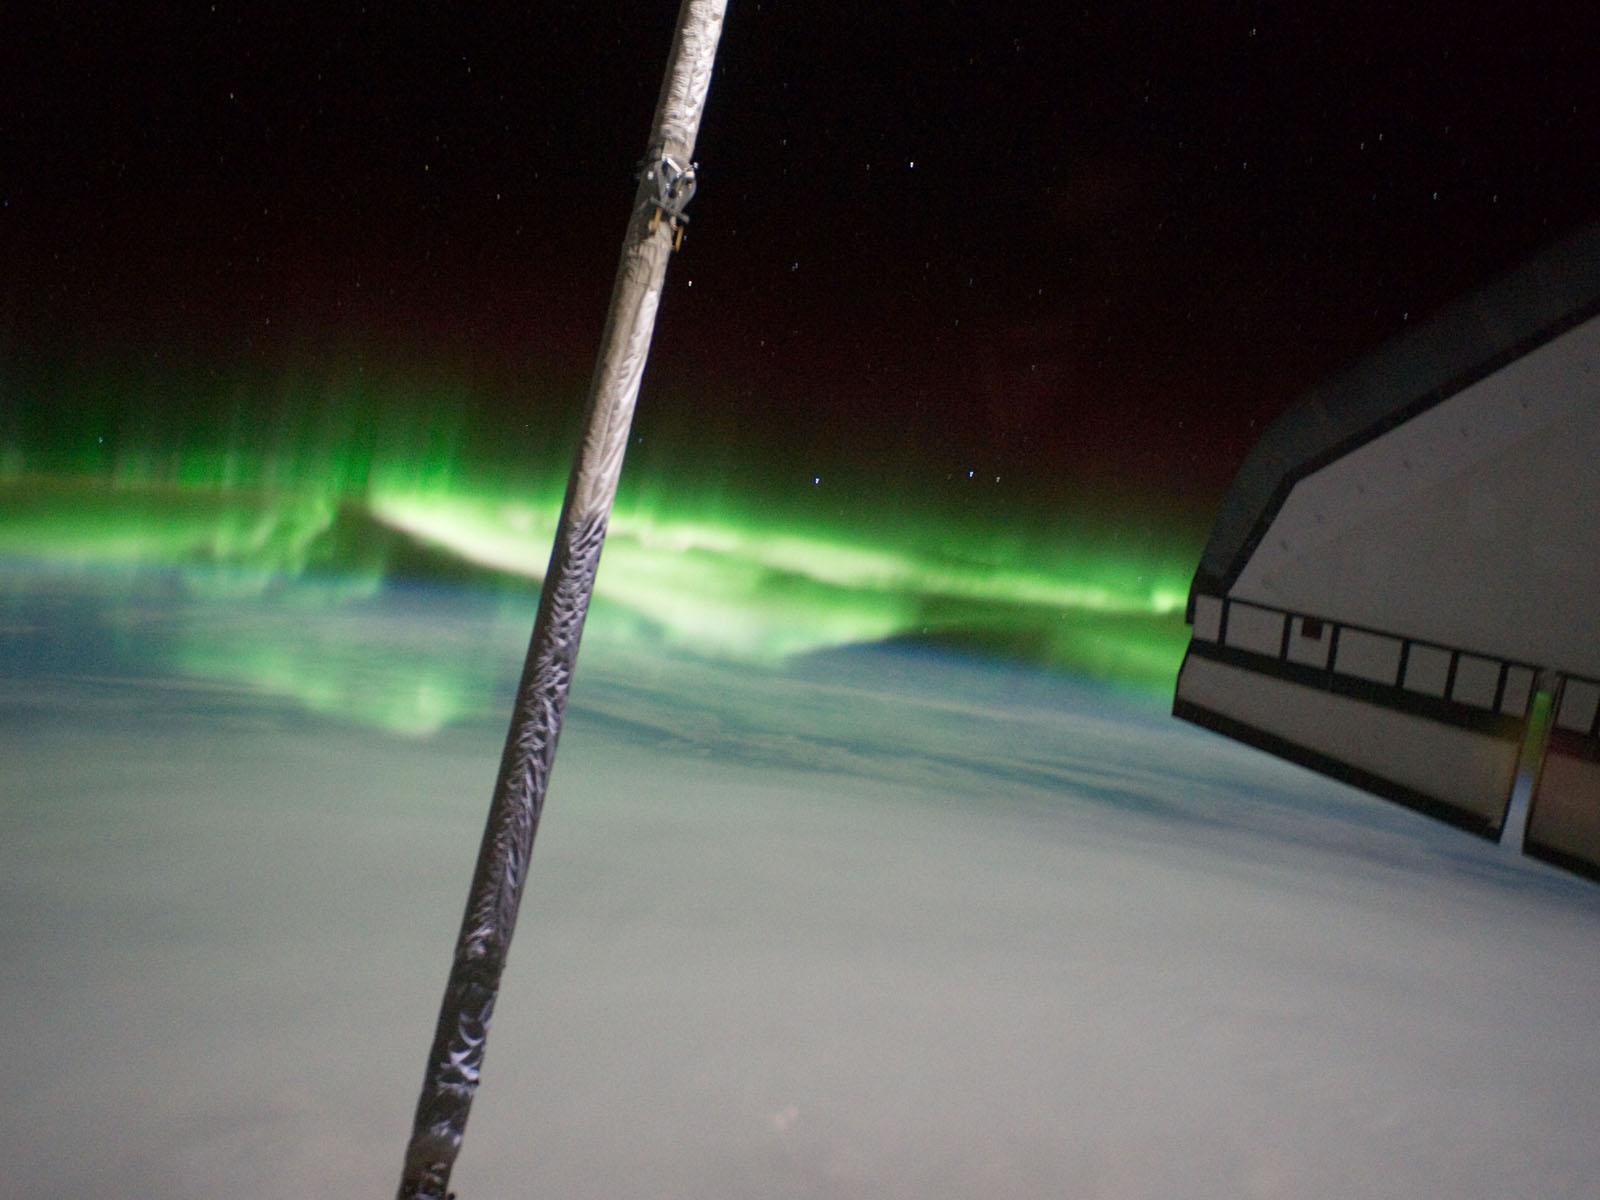 Imagenes del Transbordador Espacial